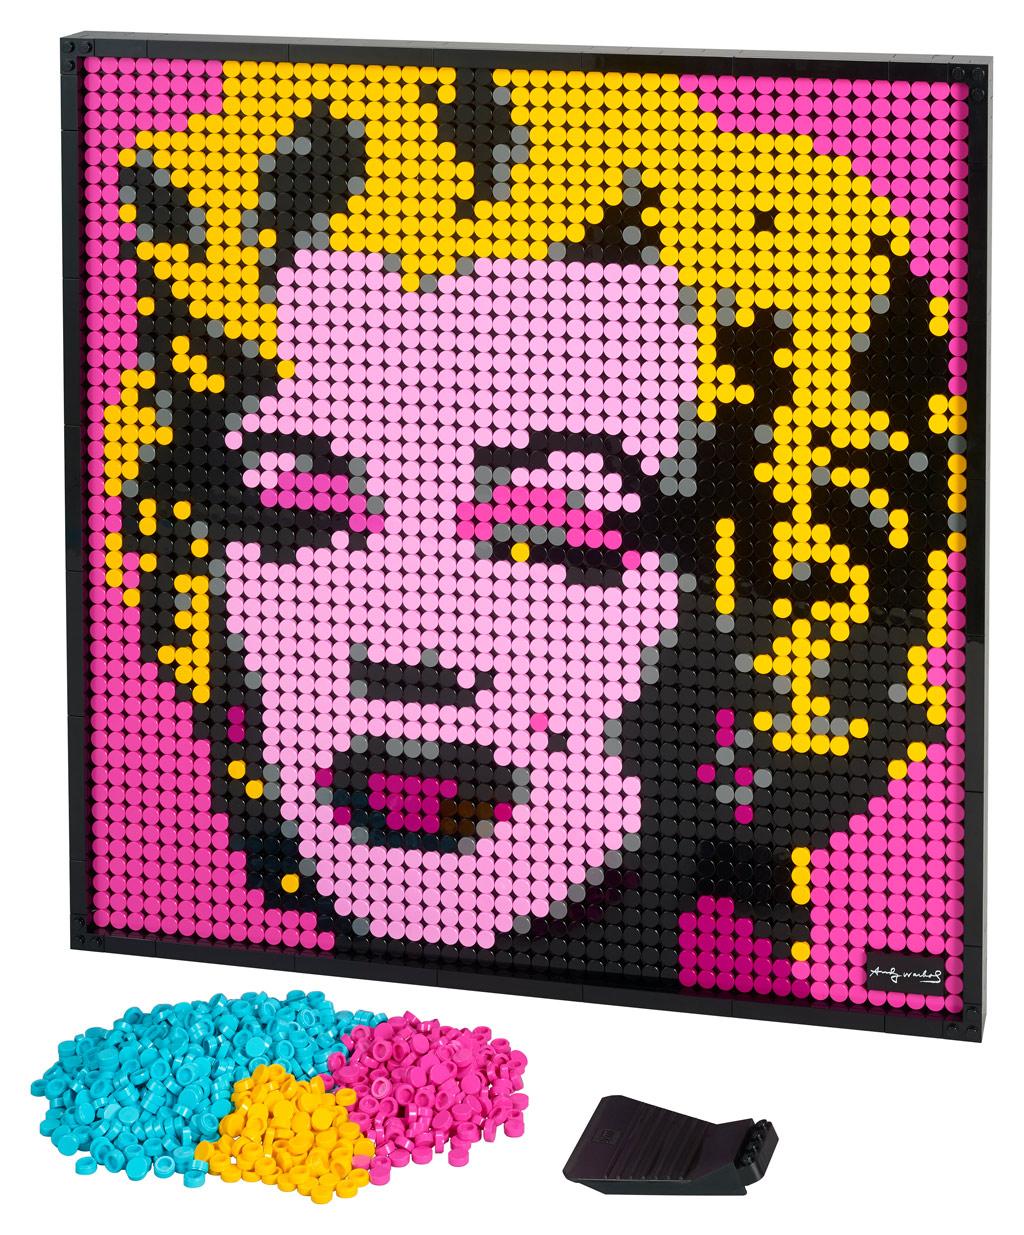 lego-arts-31197-andy-warhols-marilyn-monroe-2020-inhalt zusammengebaut.com